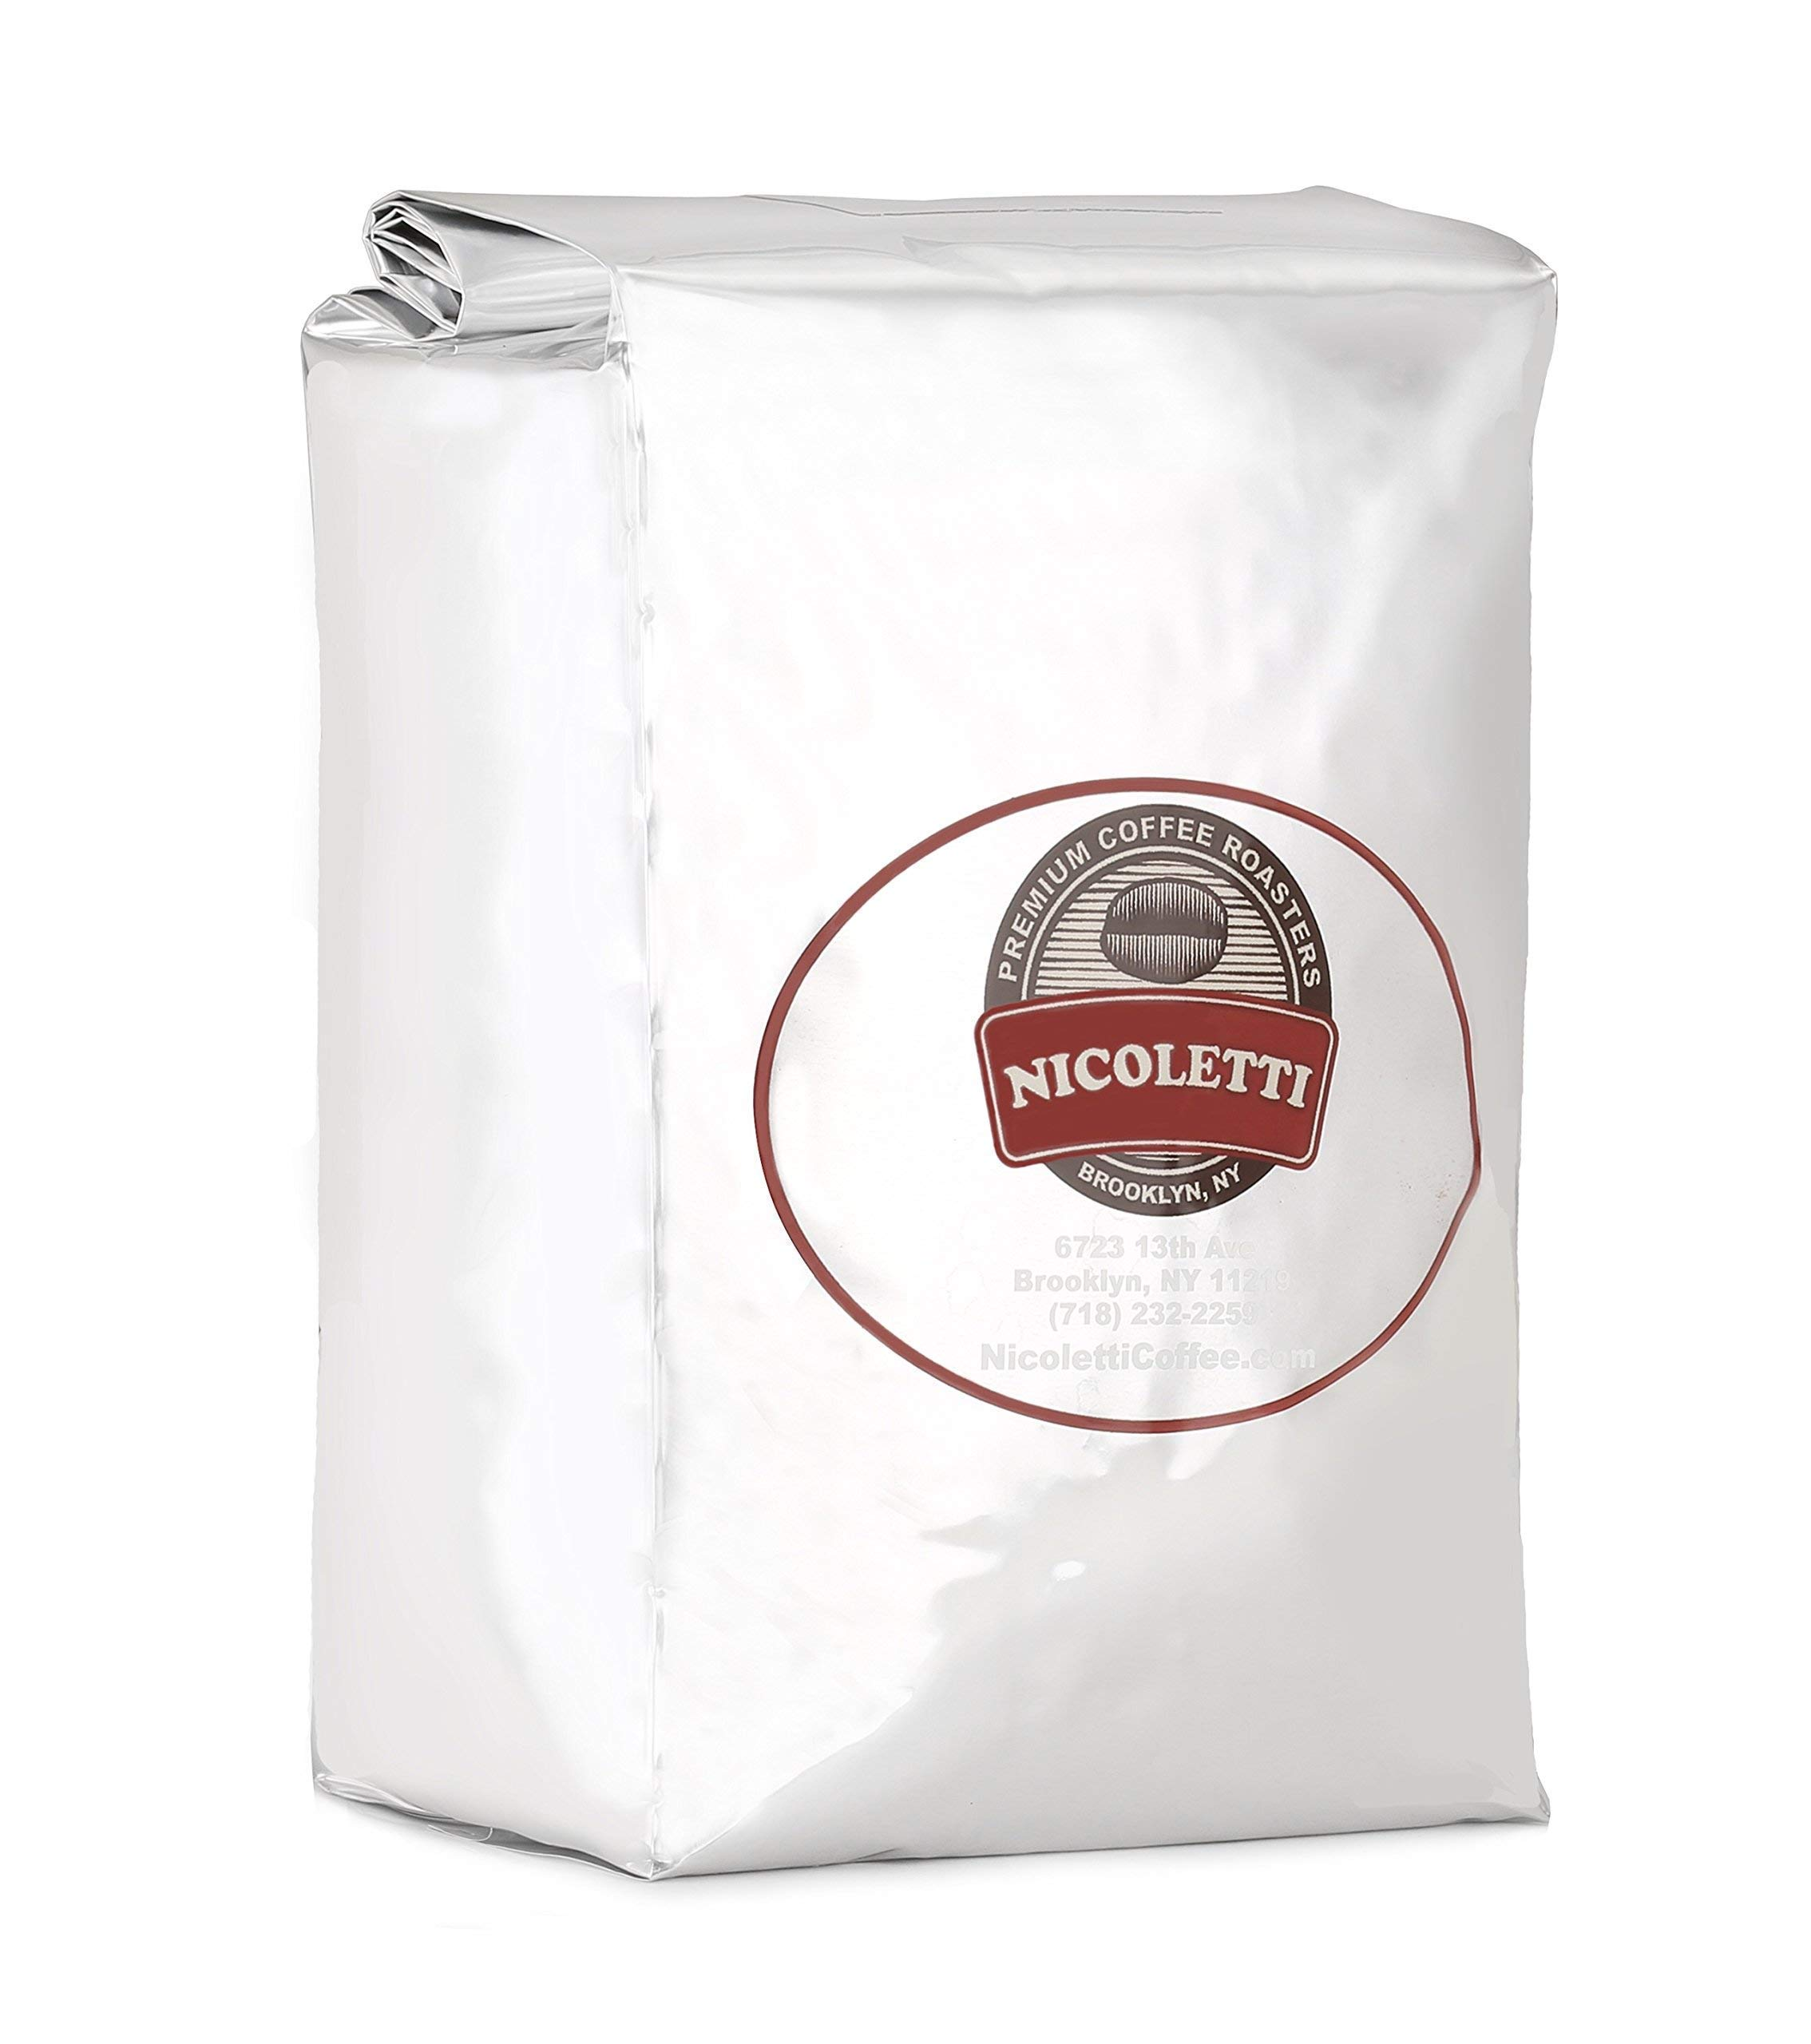 Nicoletti Coffee Espresso Roast Beans 2.20lb (Made in Brooklyn NY since 1972)